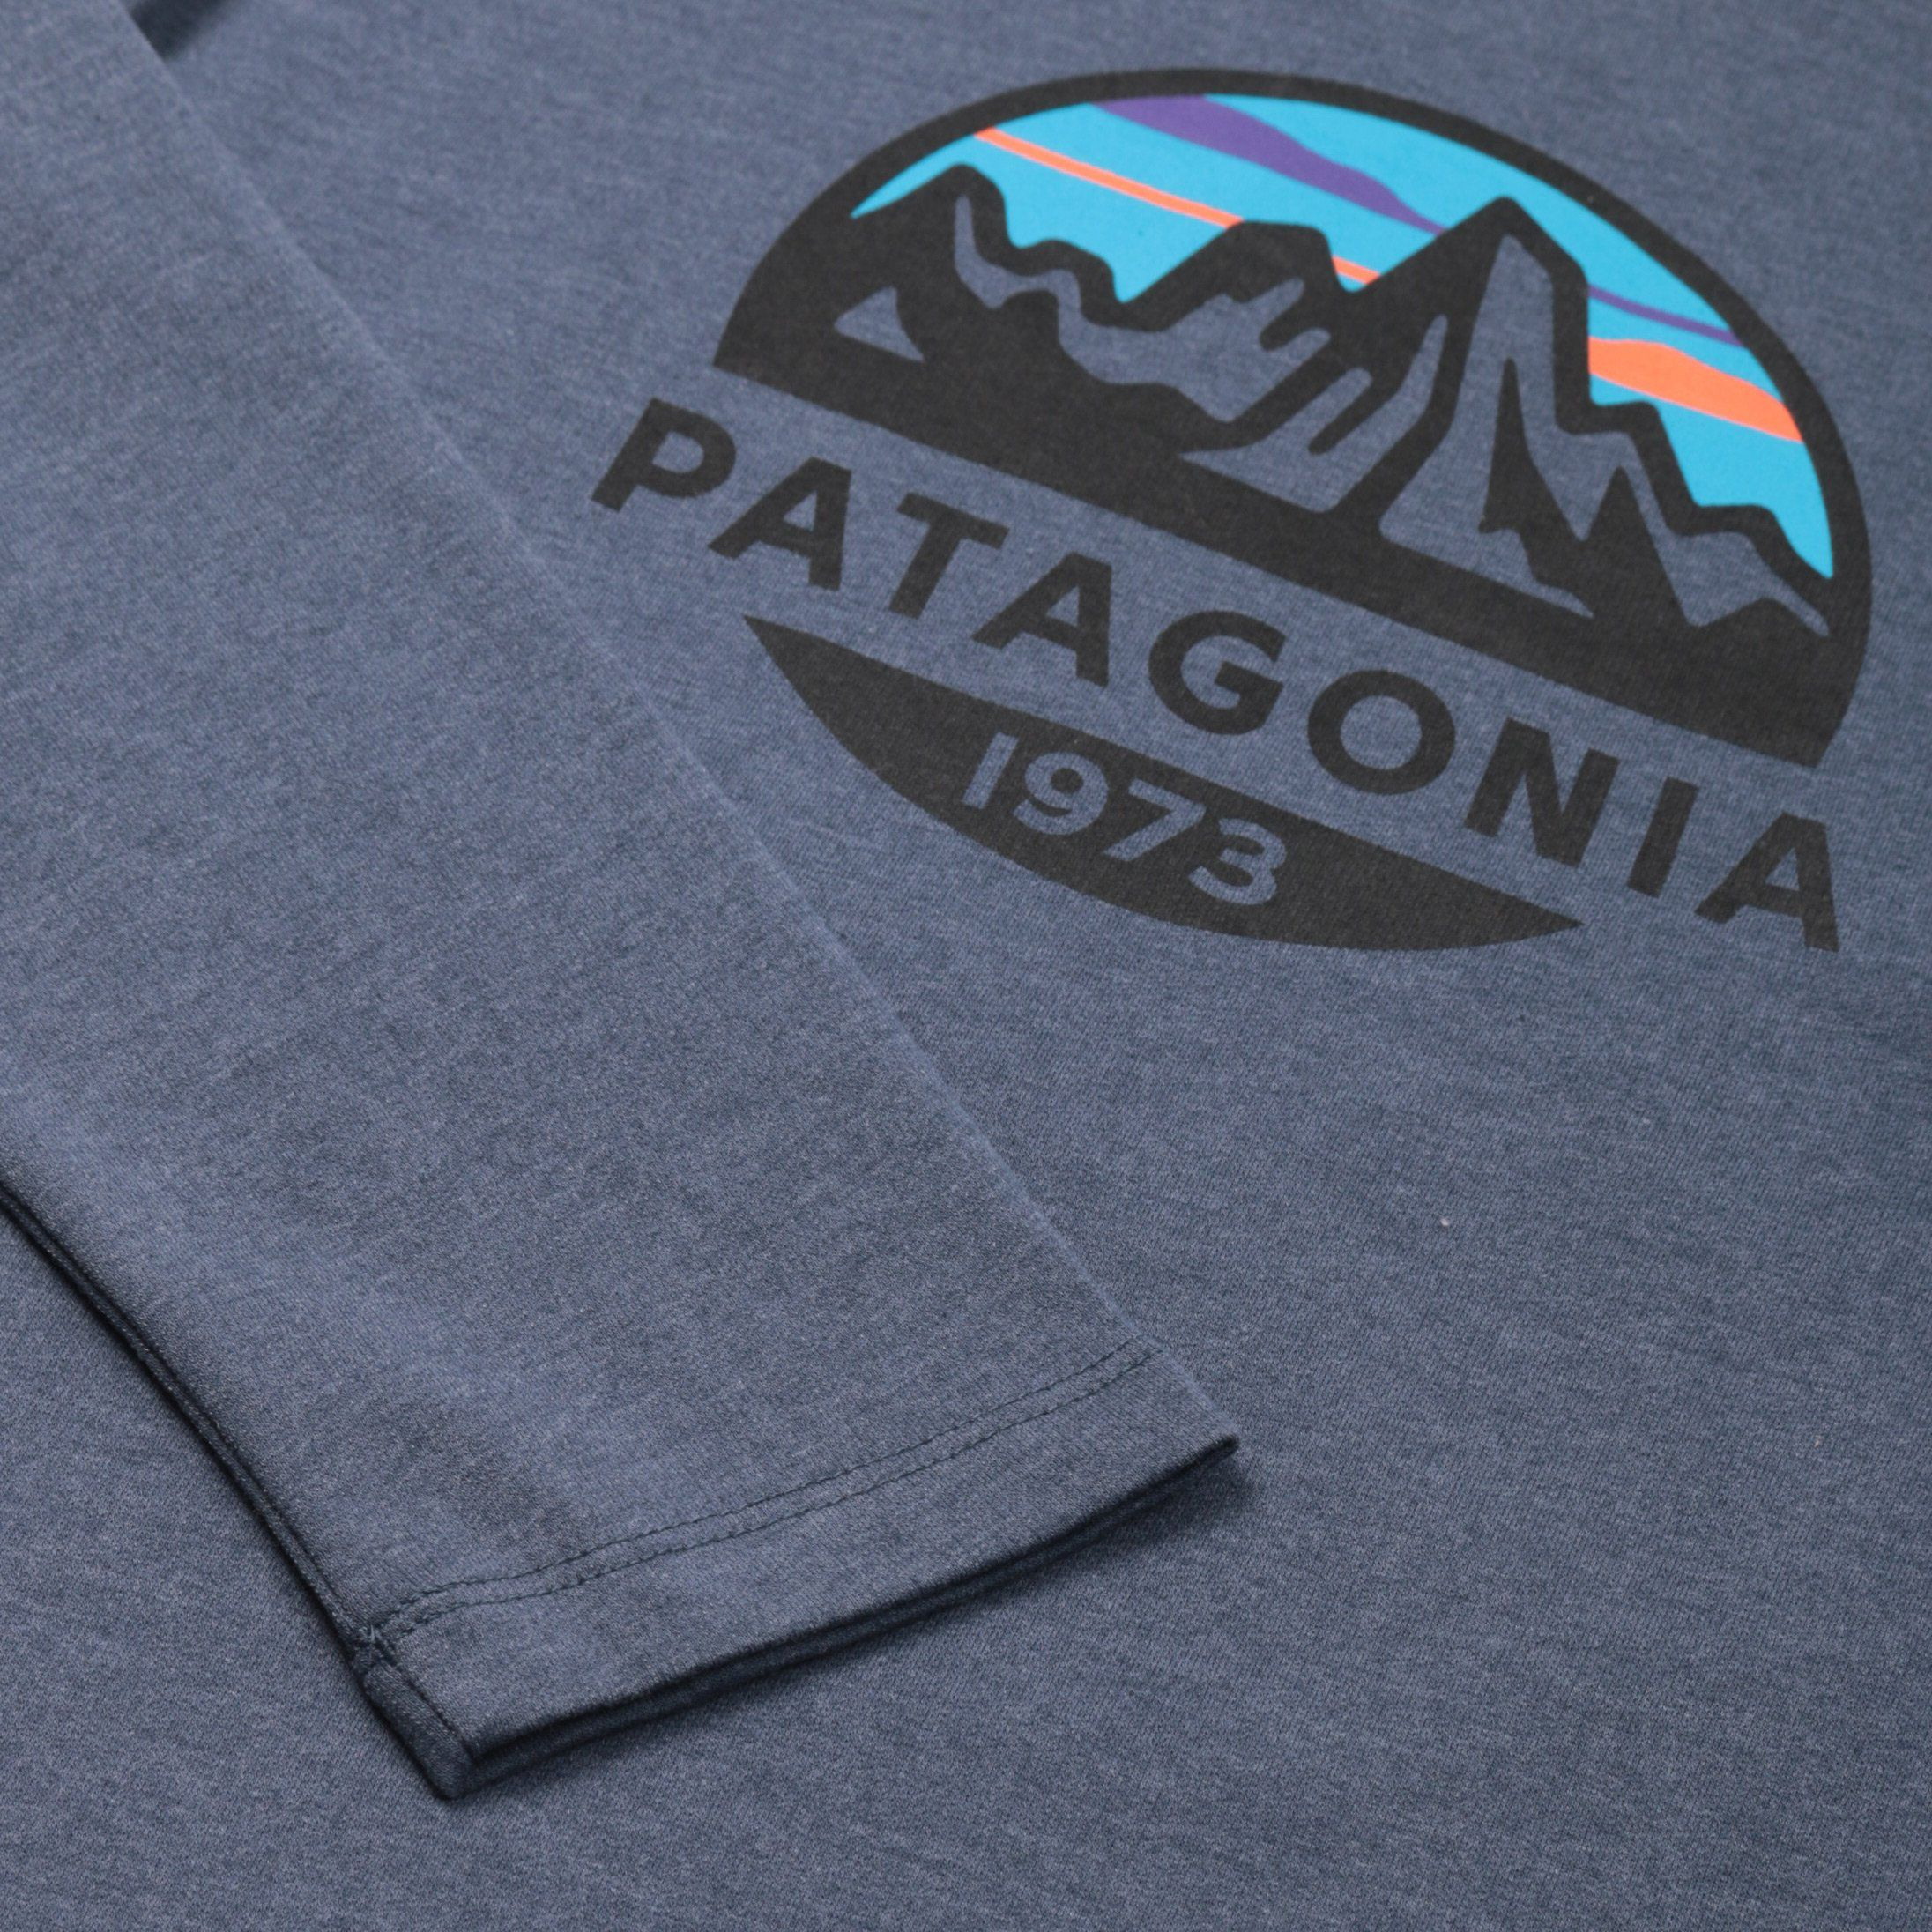 Patagonia Fitzroy Scope Sweatshirt